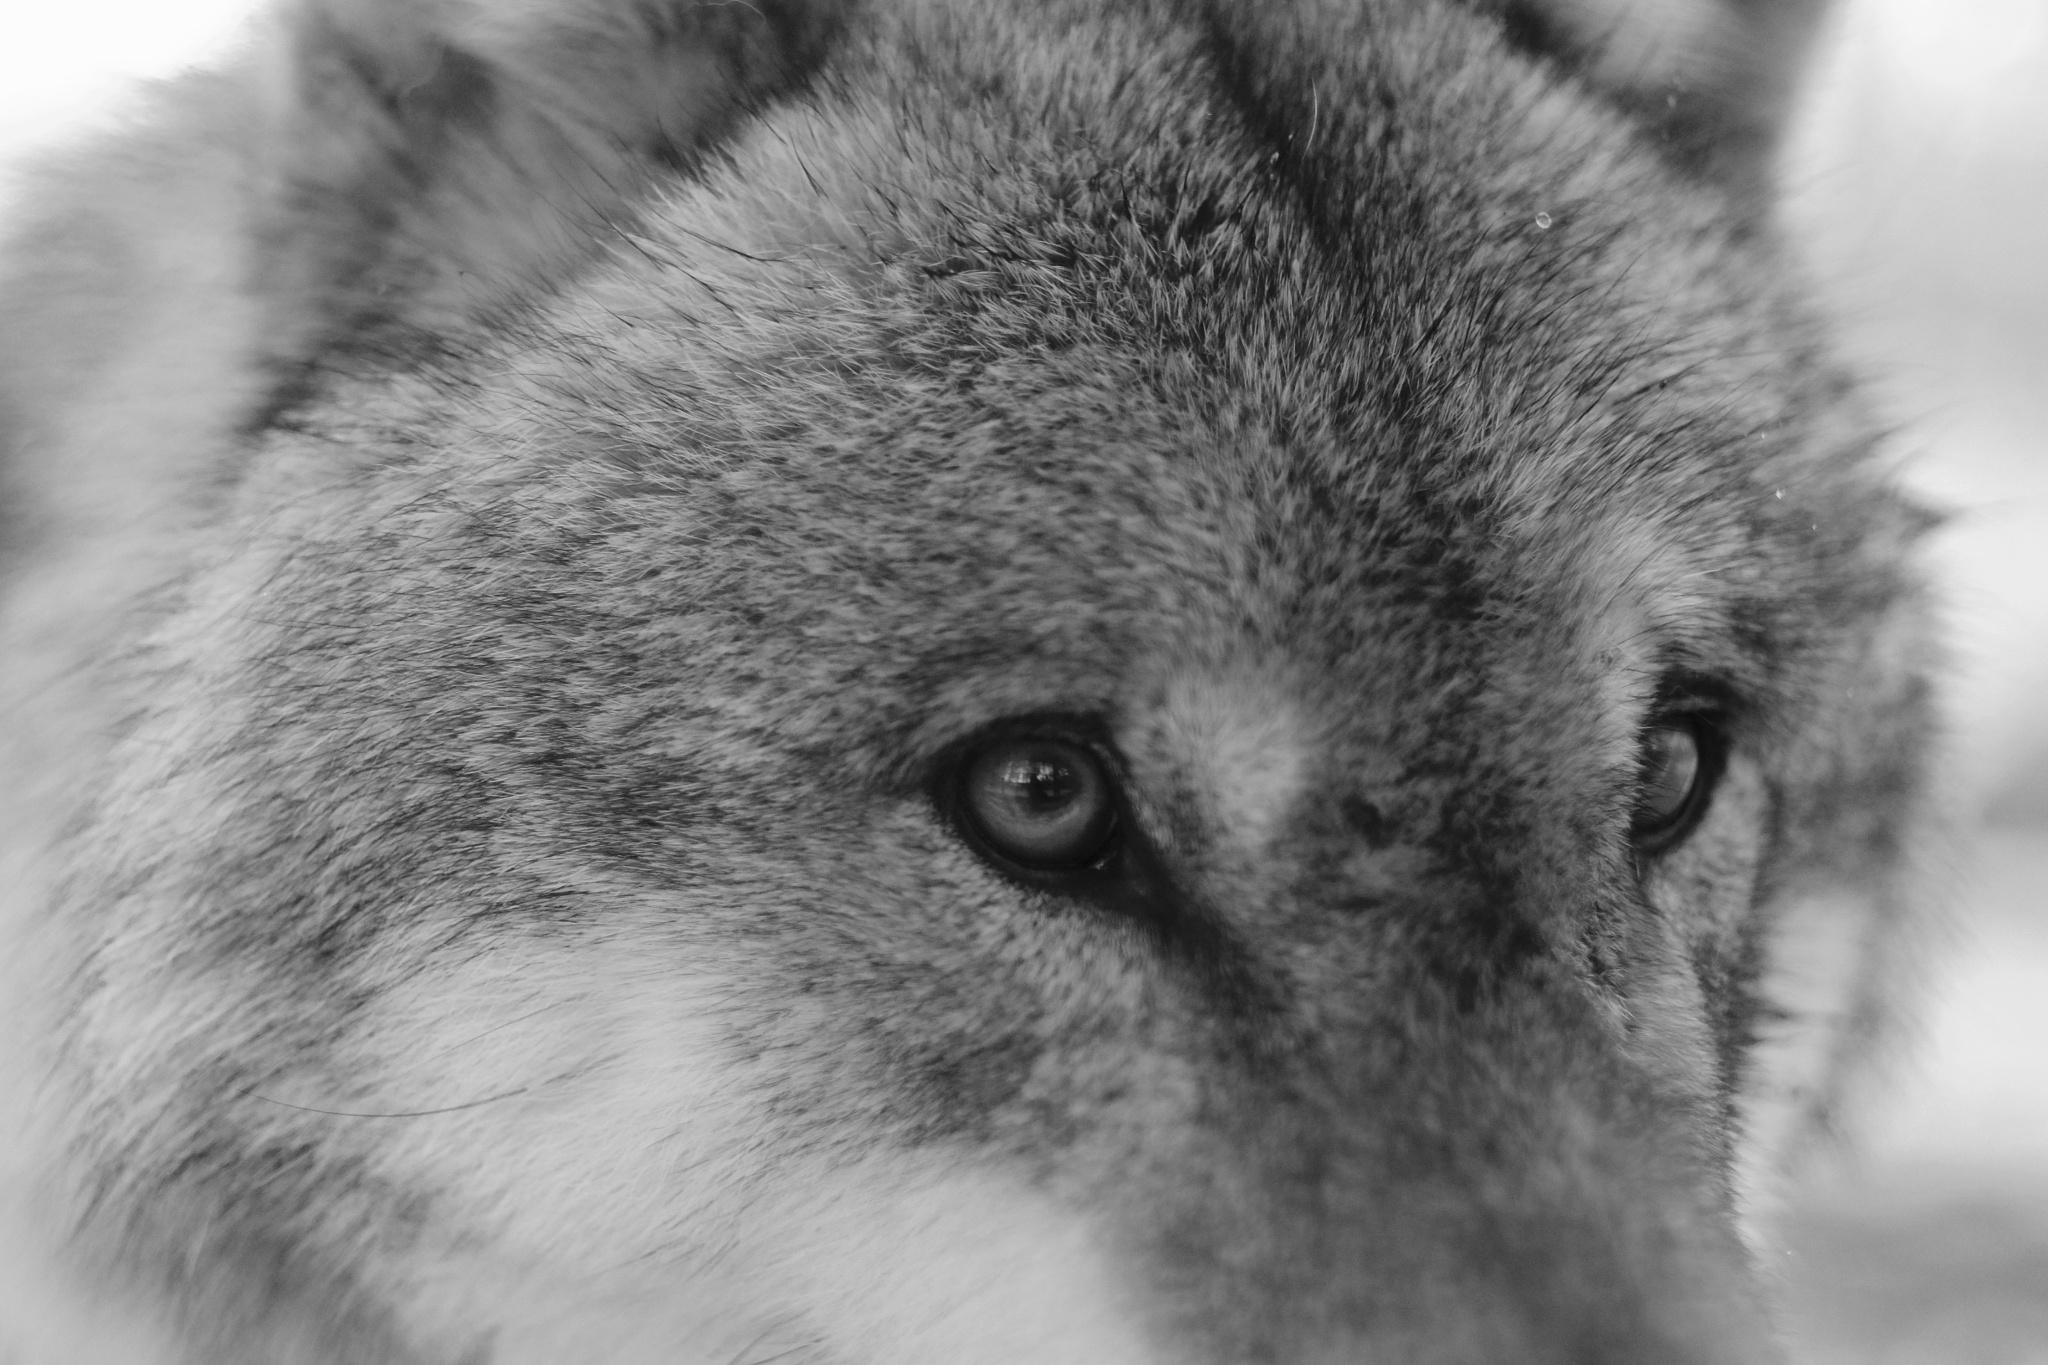 Wolfsaugen by peterkryzun